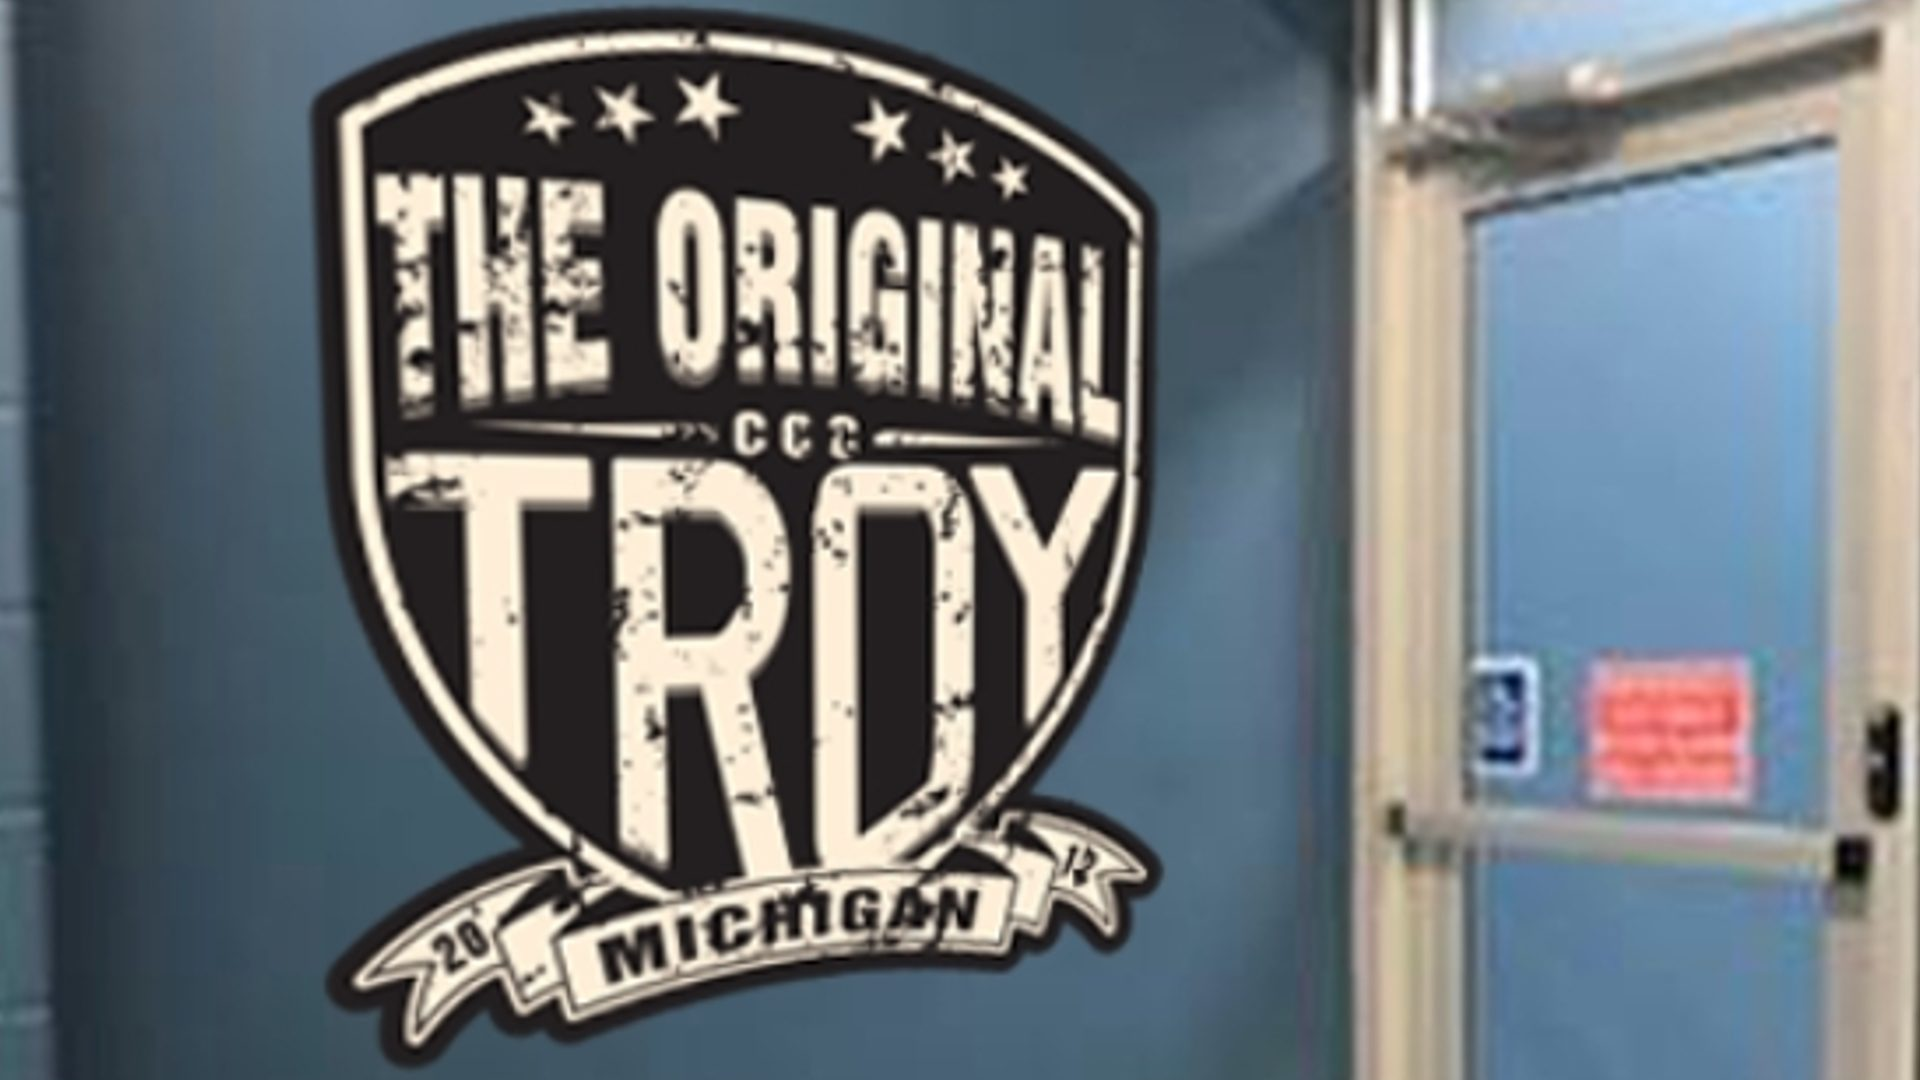 Troy Michigan Wall Graphics 1